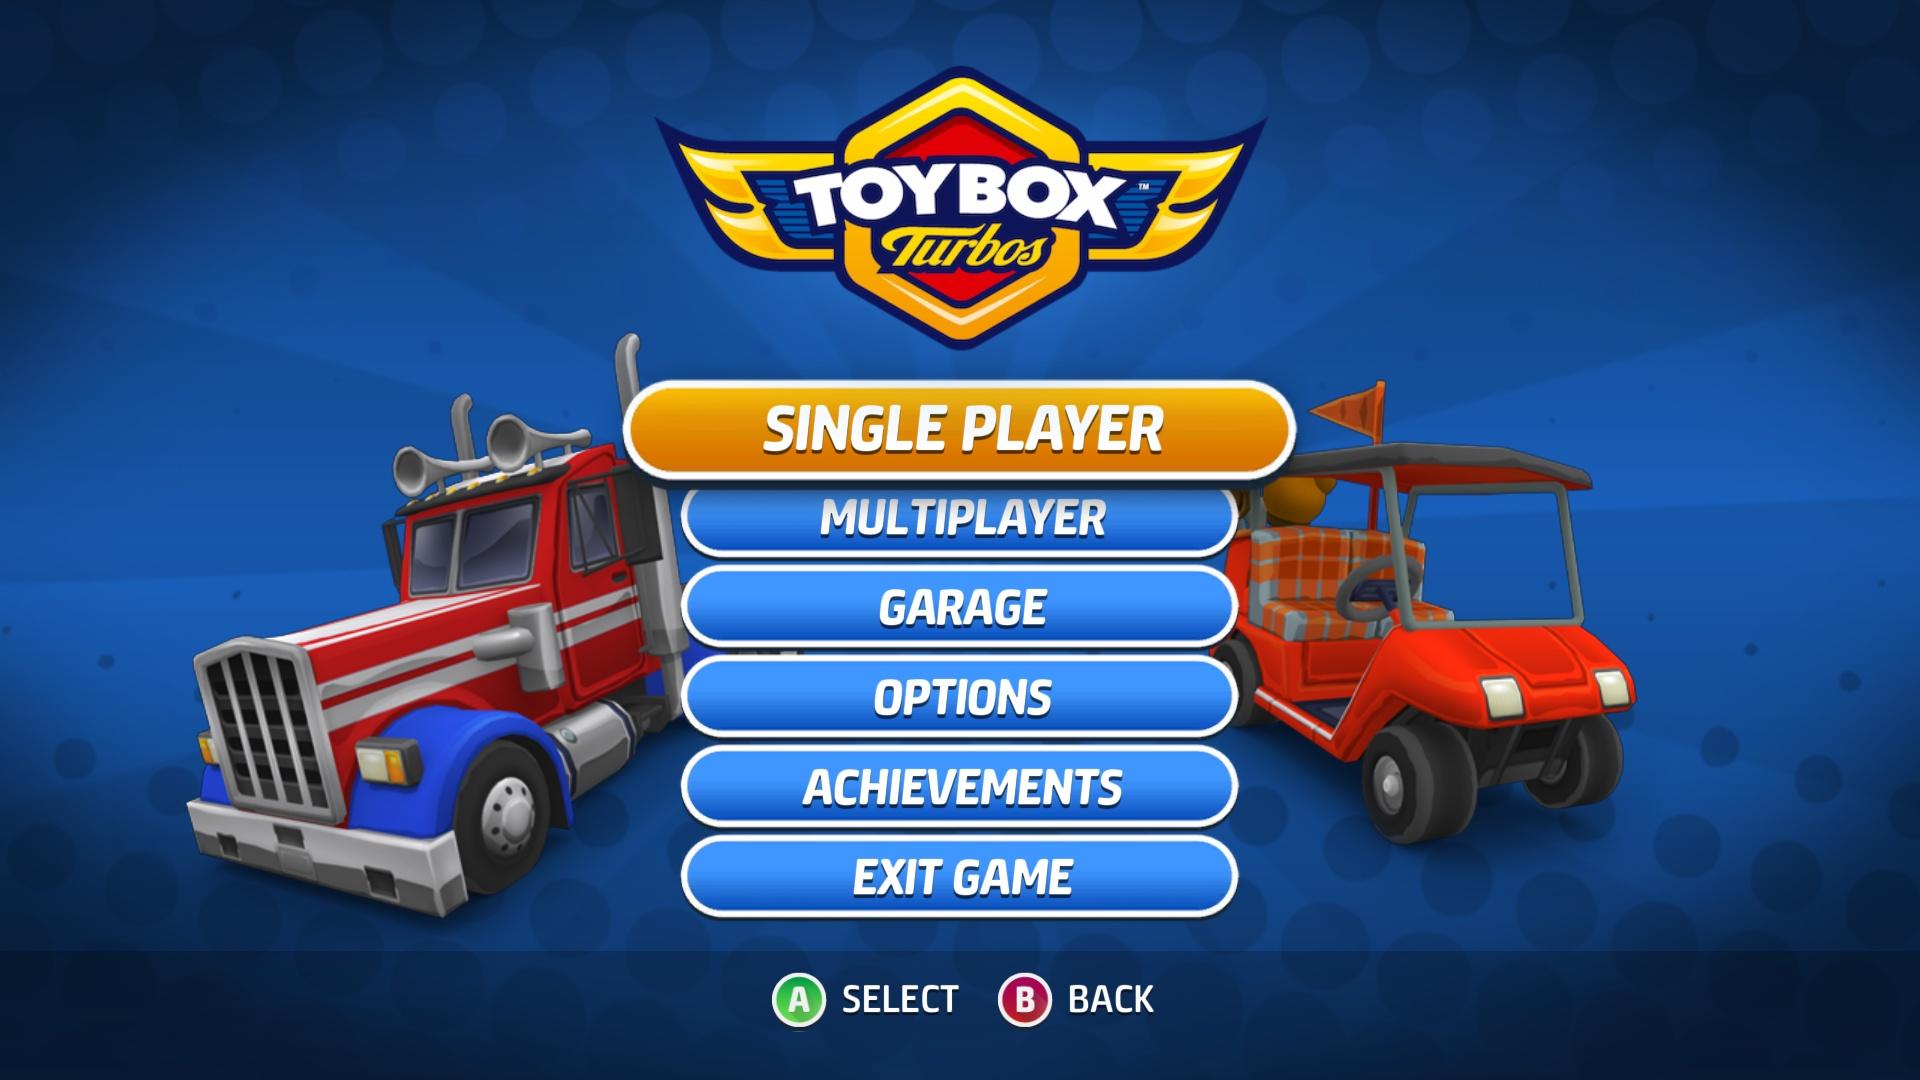 ToyboxTurbos_2015_11_28_22_13_40_969.jpg